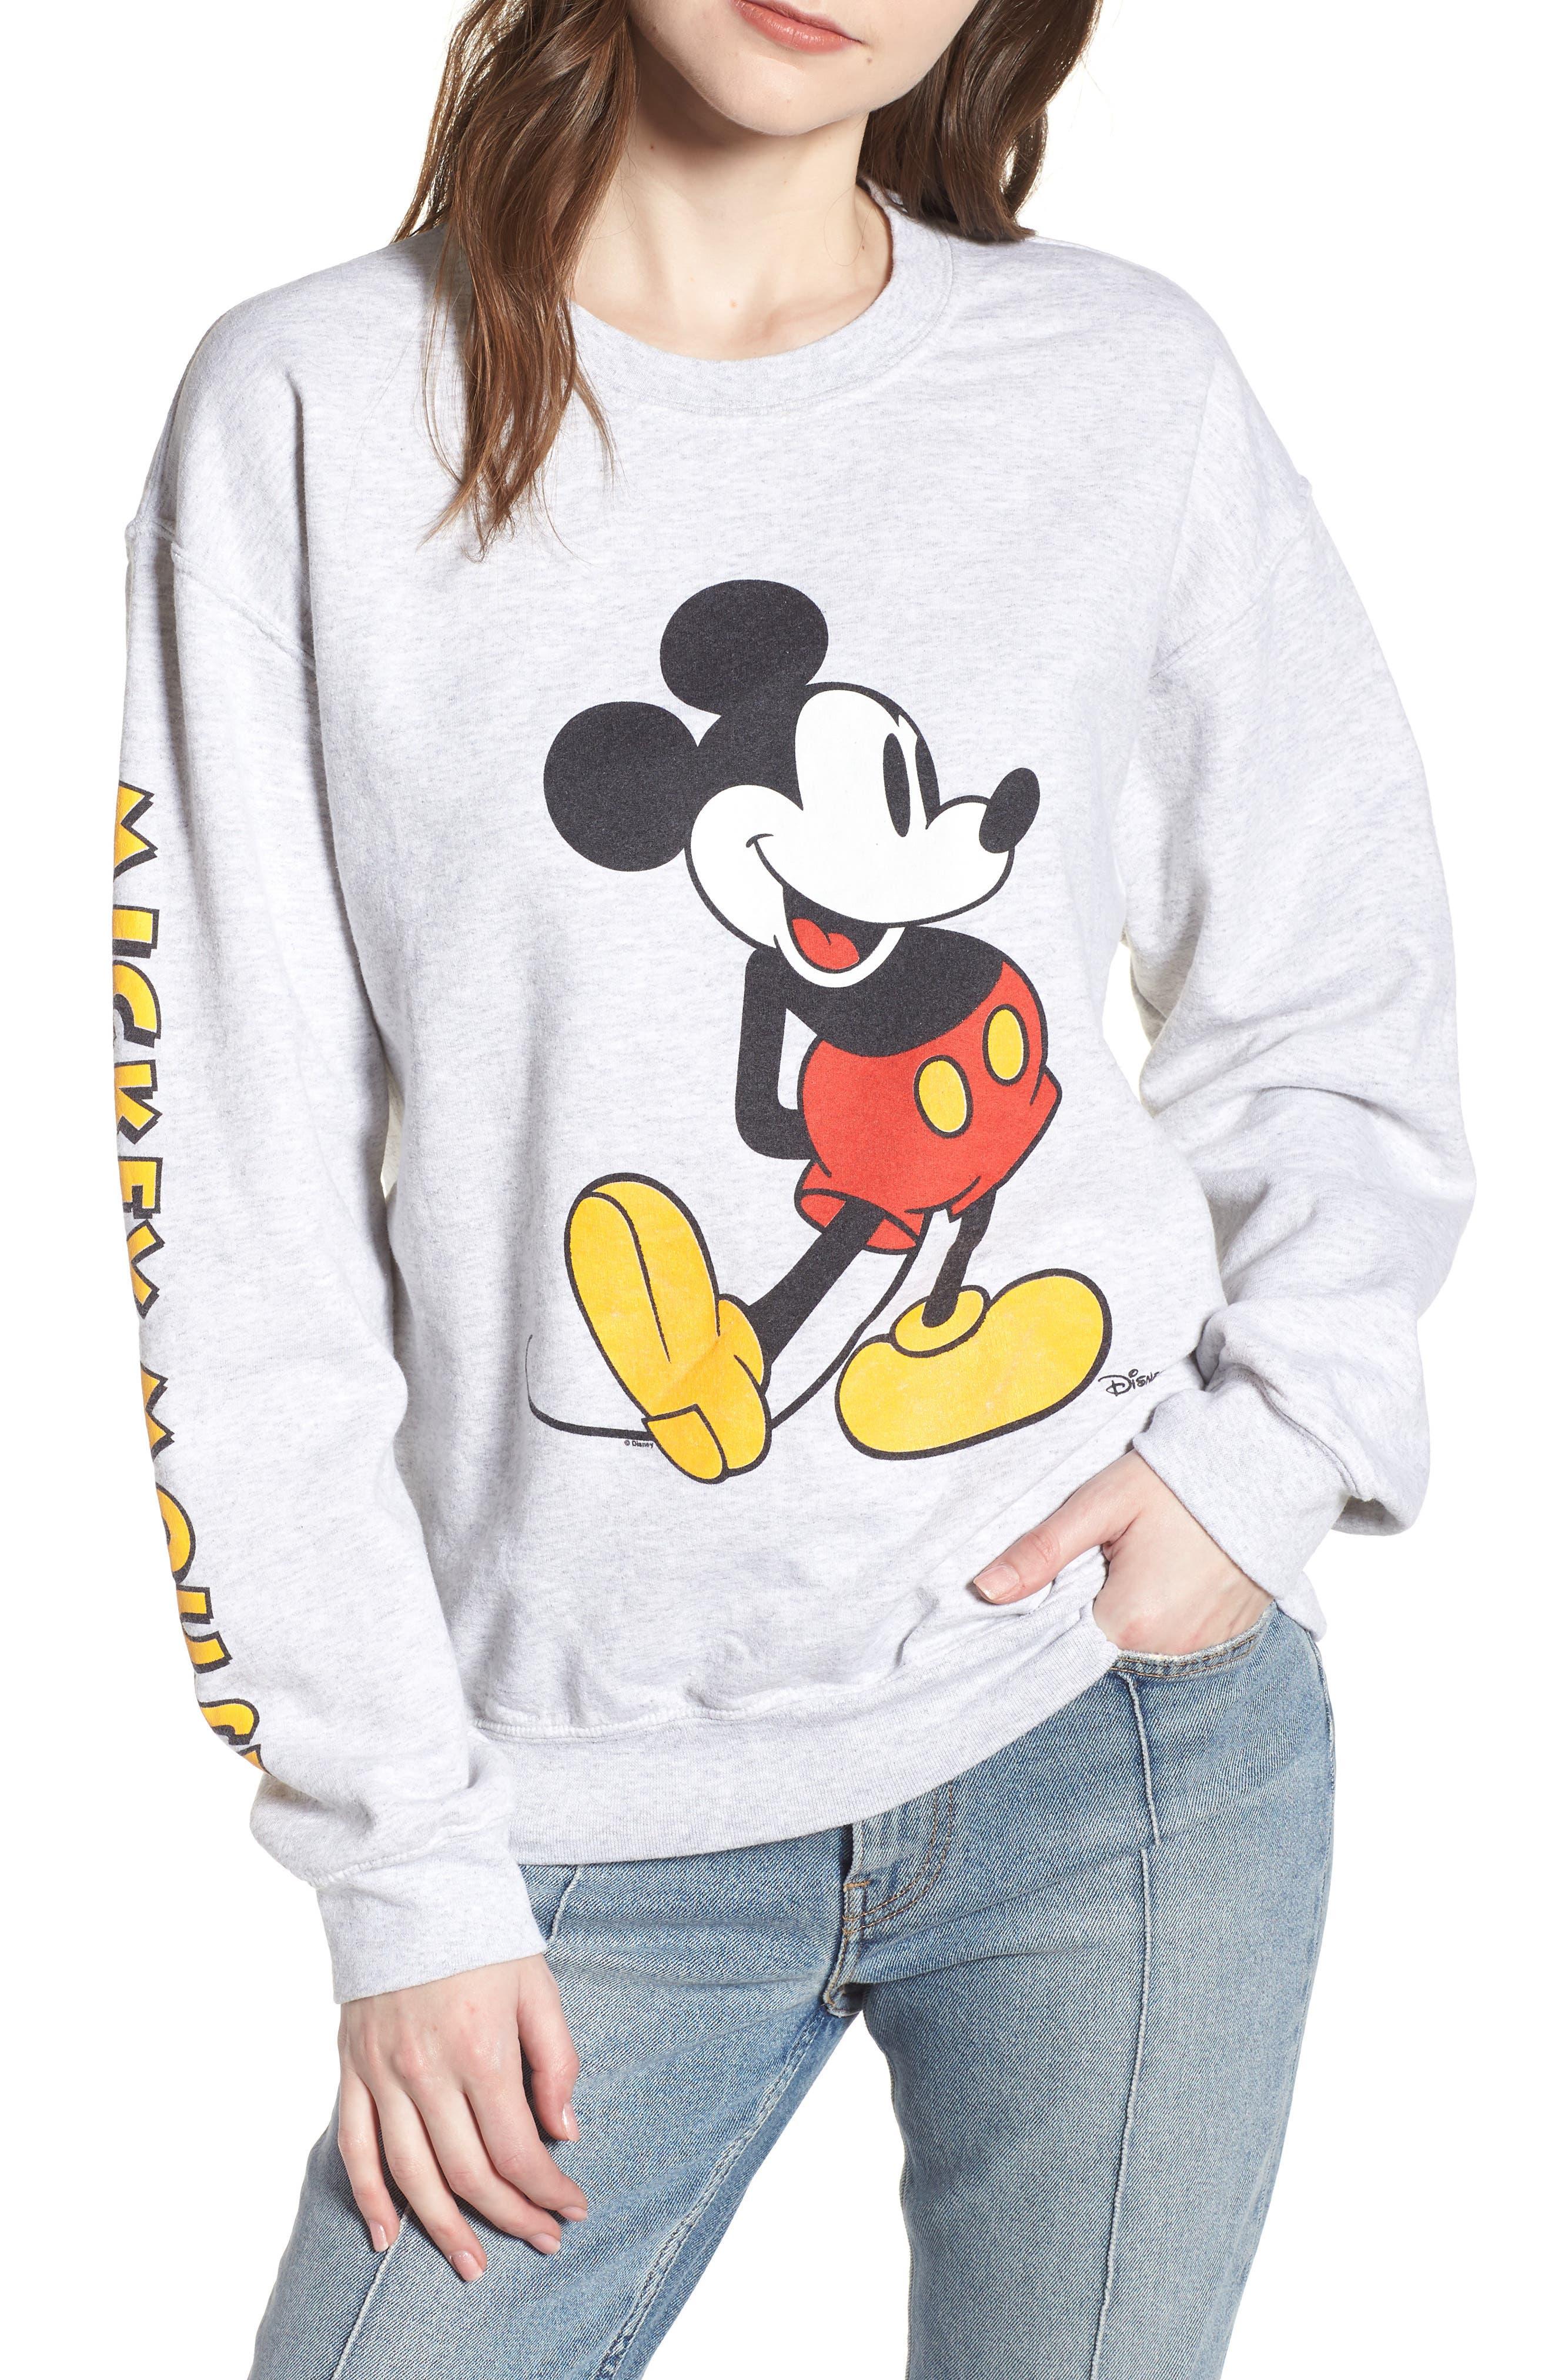 Junk Food Mickey Mouse Oversize Sweatshirt